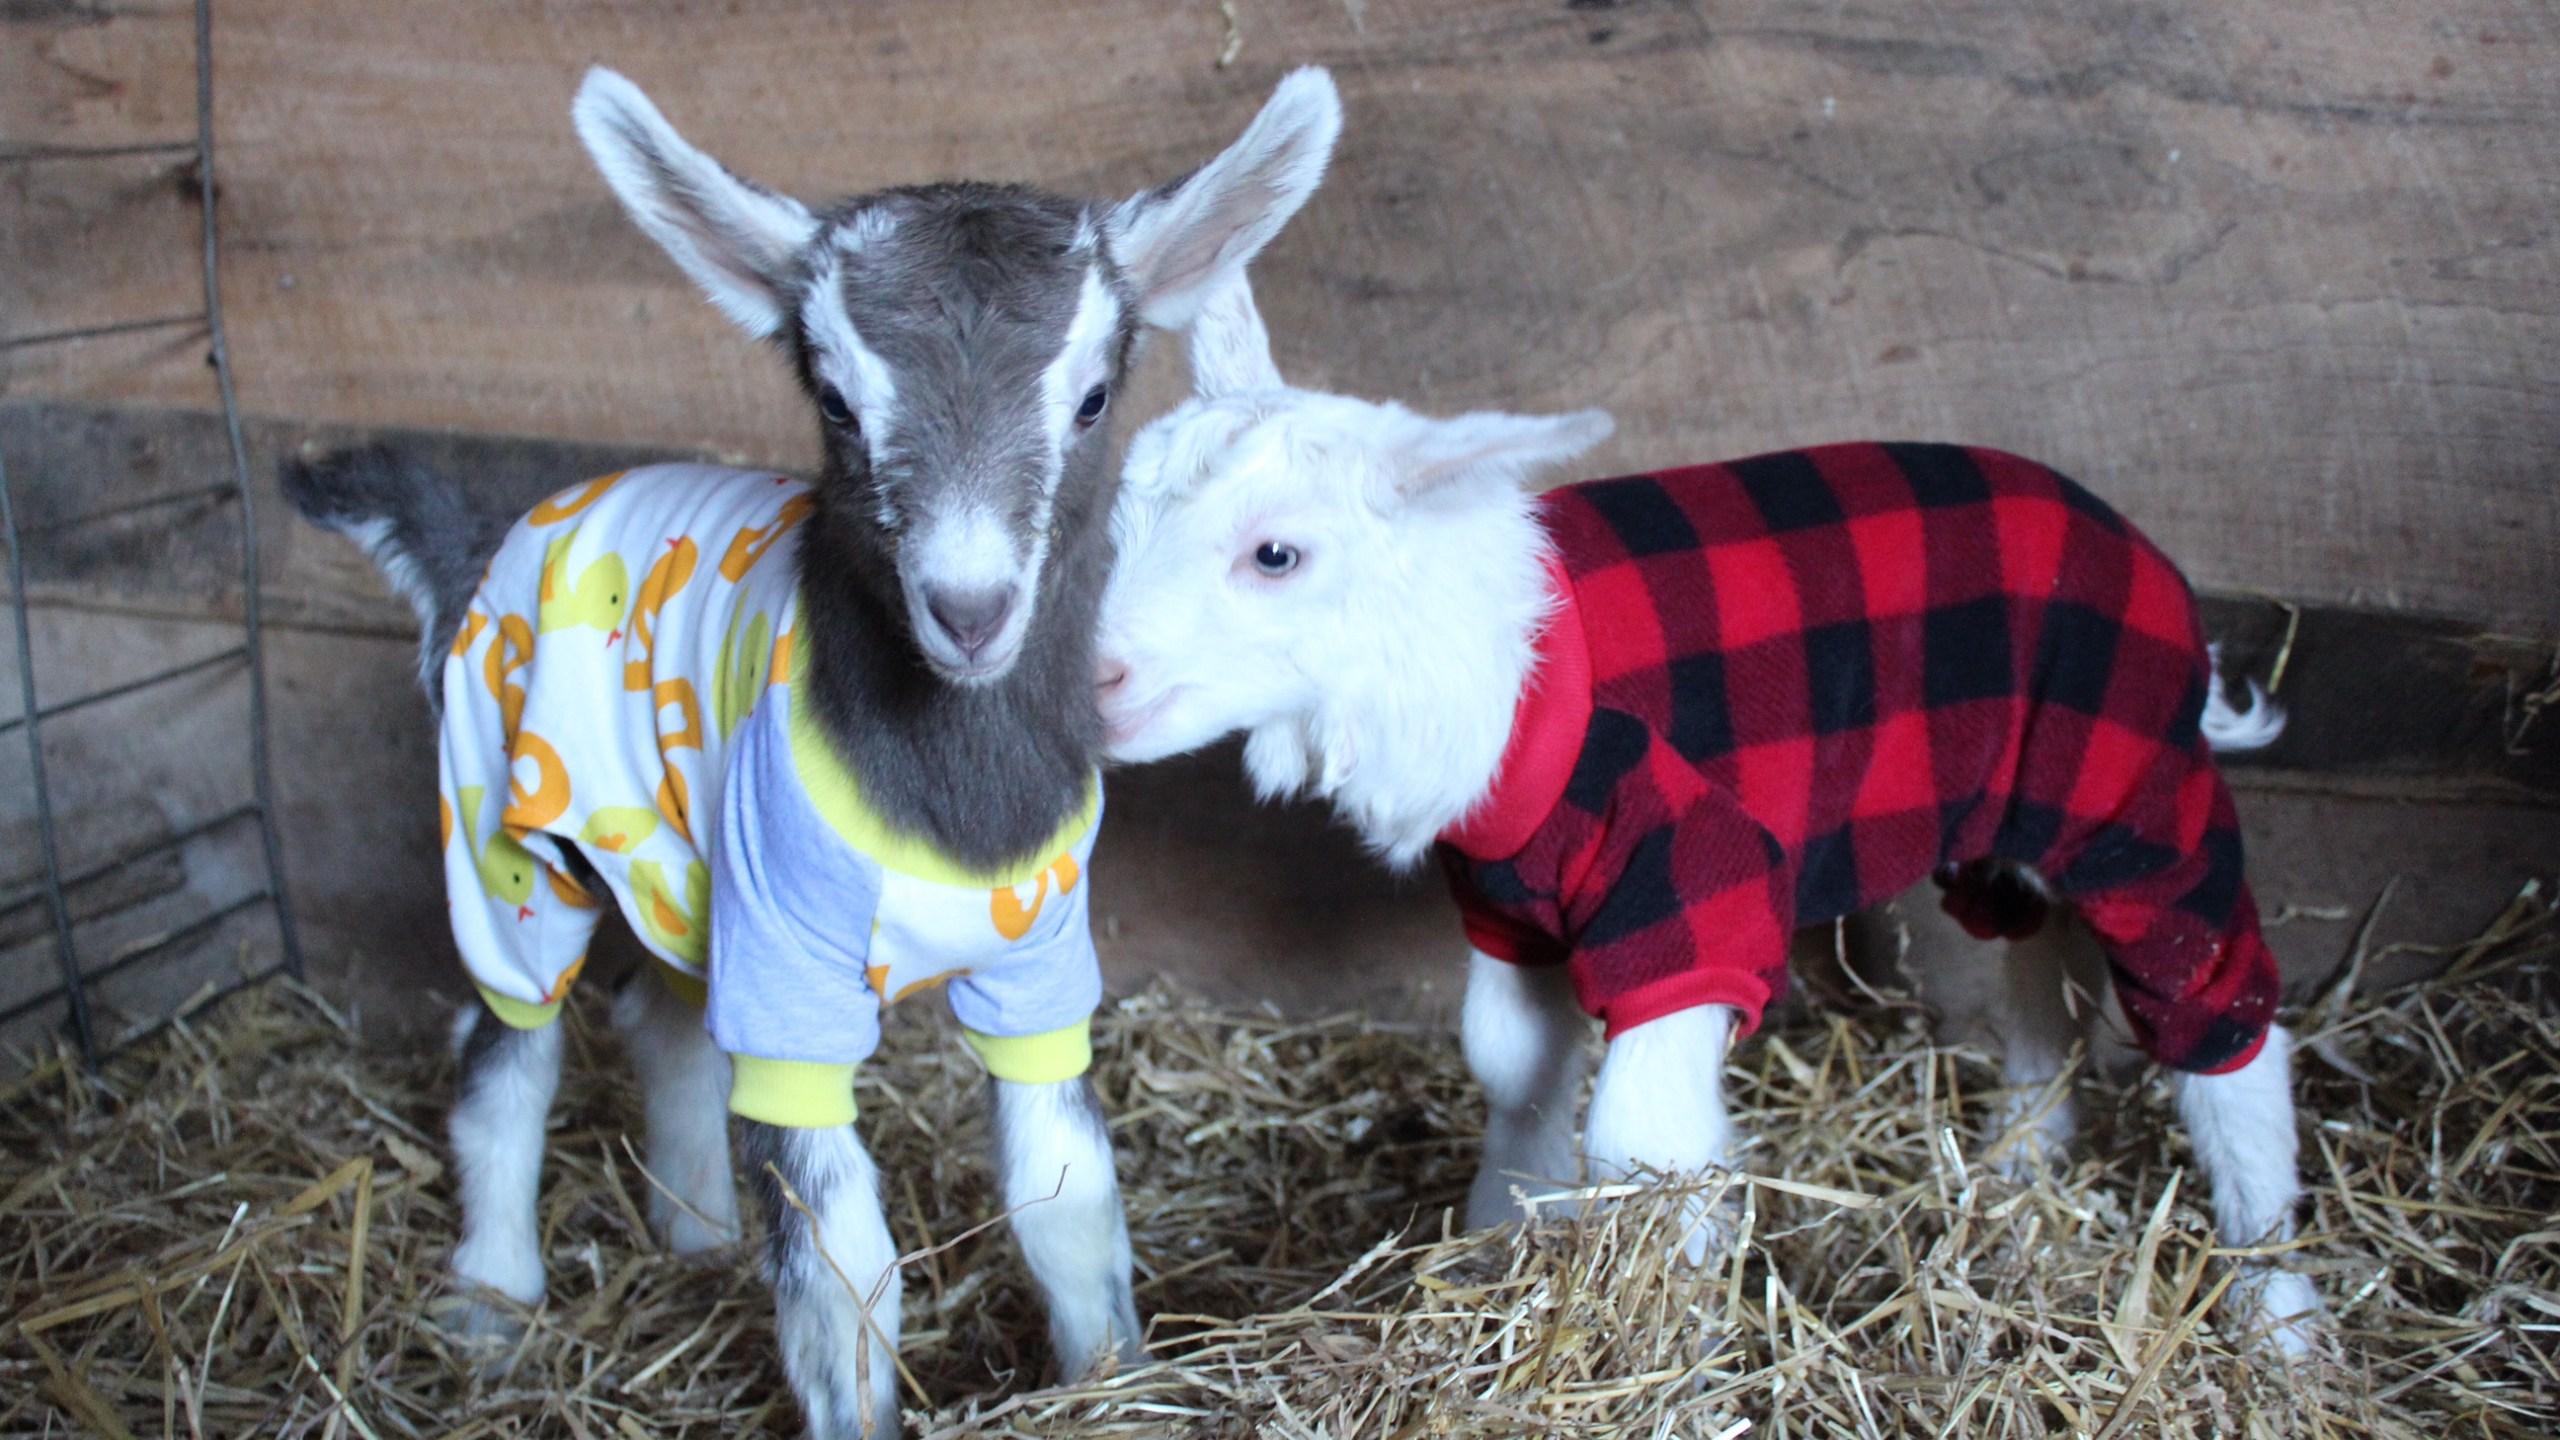 Goats in PJs_1554588020699.JPG.jpg